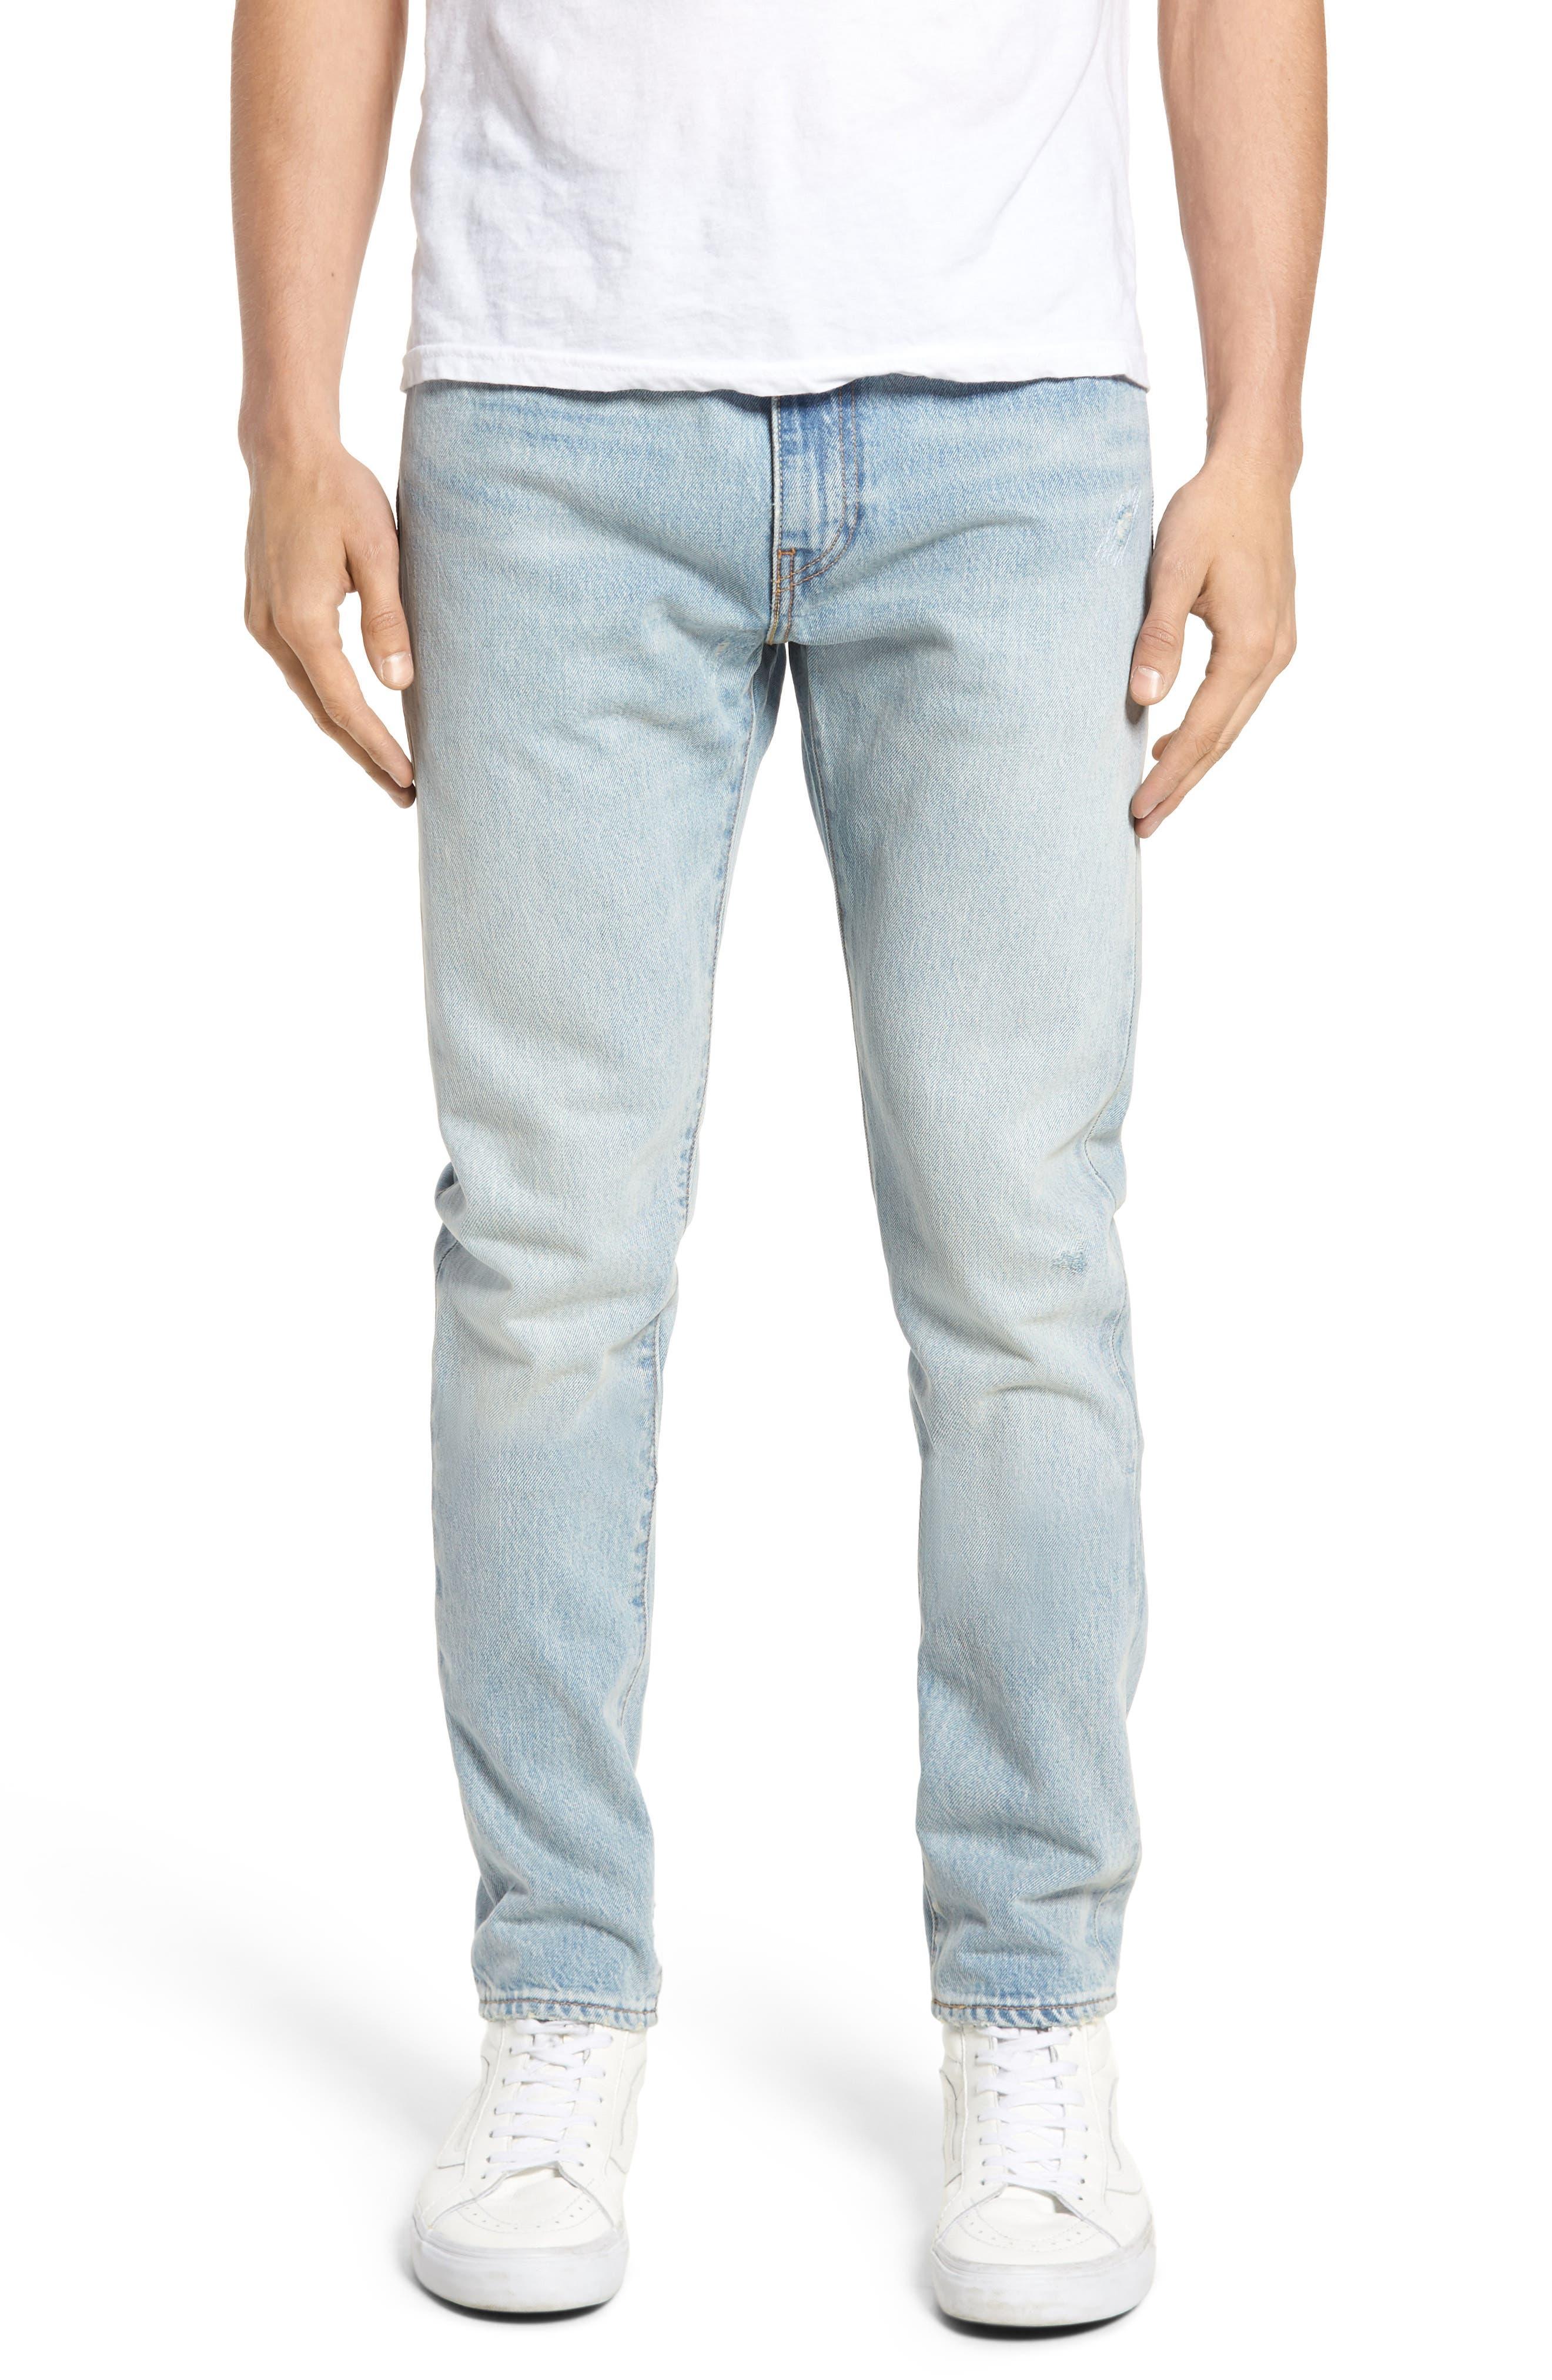 Alternate Image 1 Selected - Levi's® 512™ Skinny Fit Crop Jeans (Medium Blue Surf Ave)